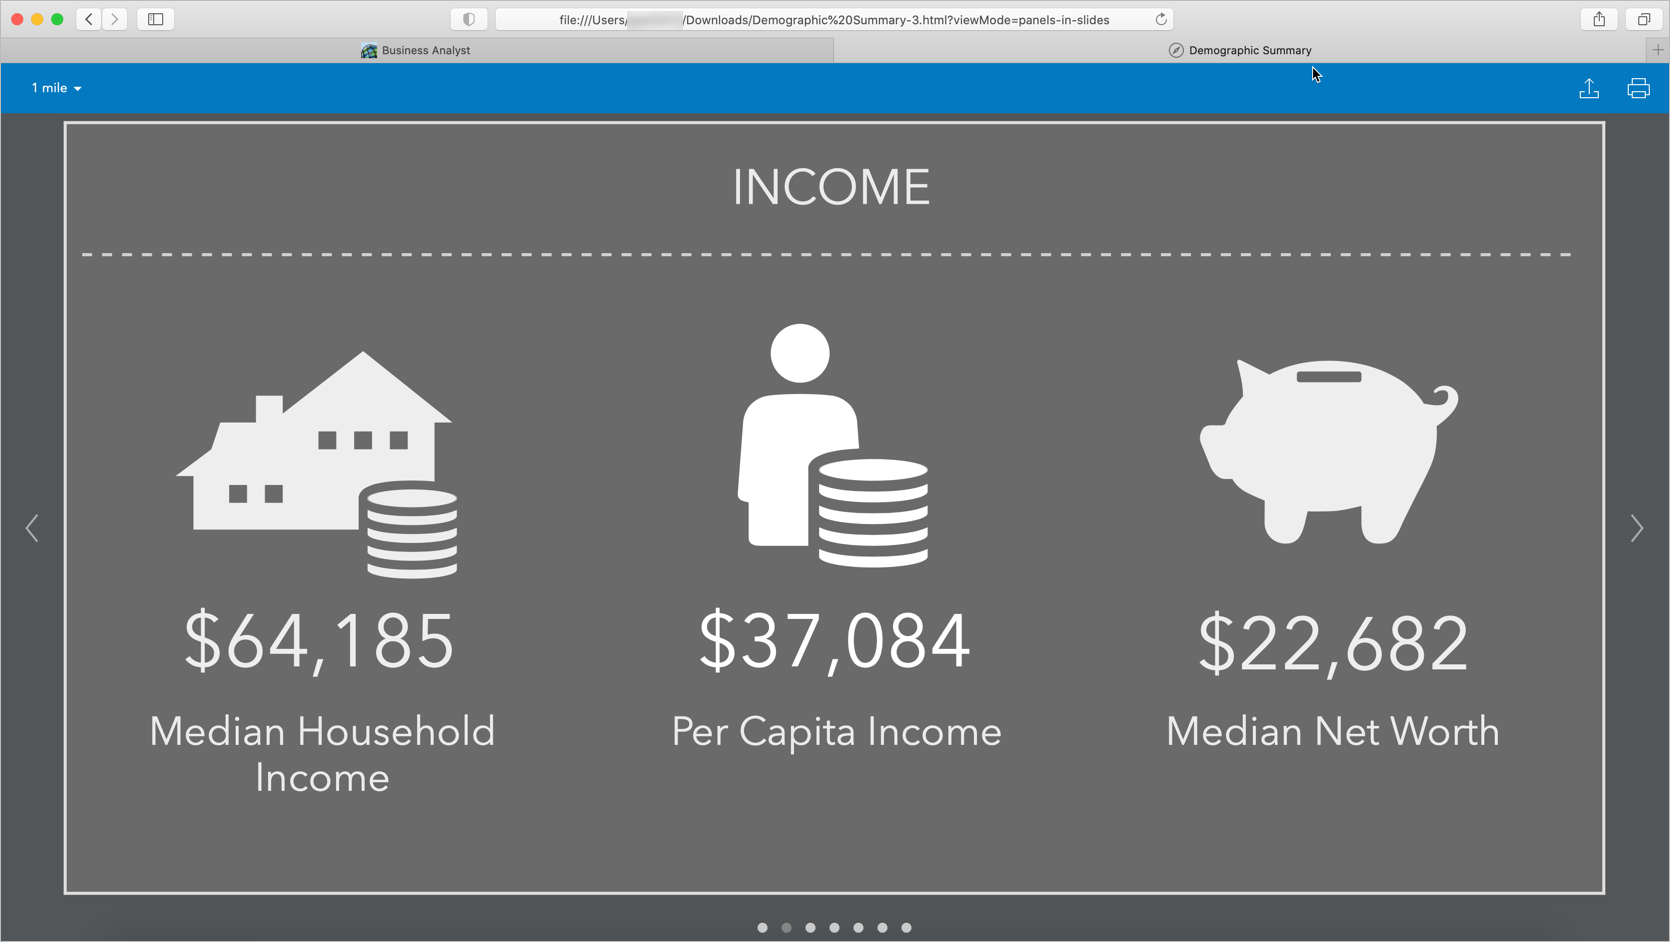 Infographic in slide mode